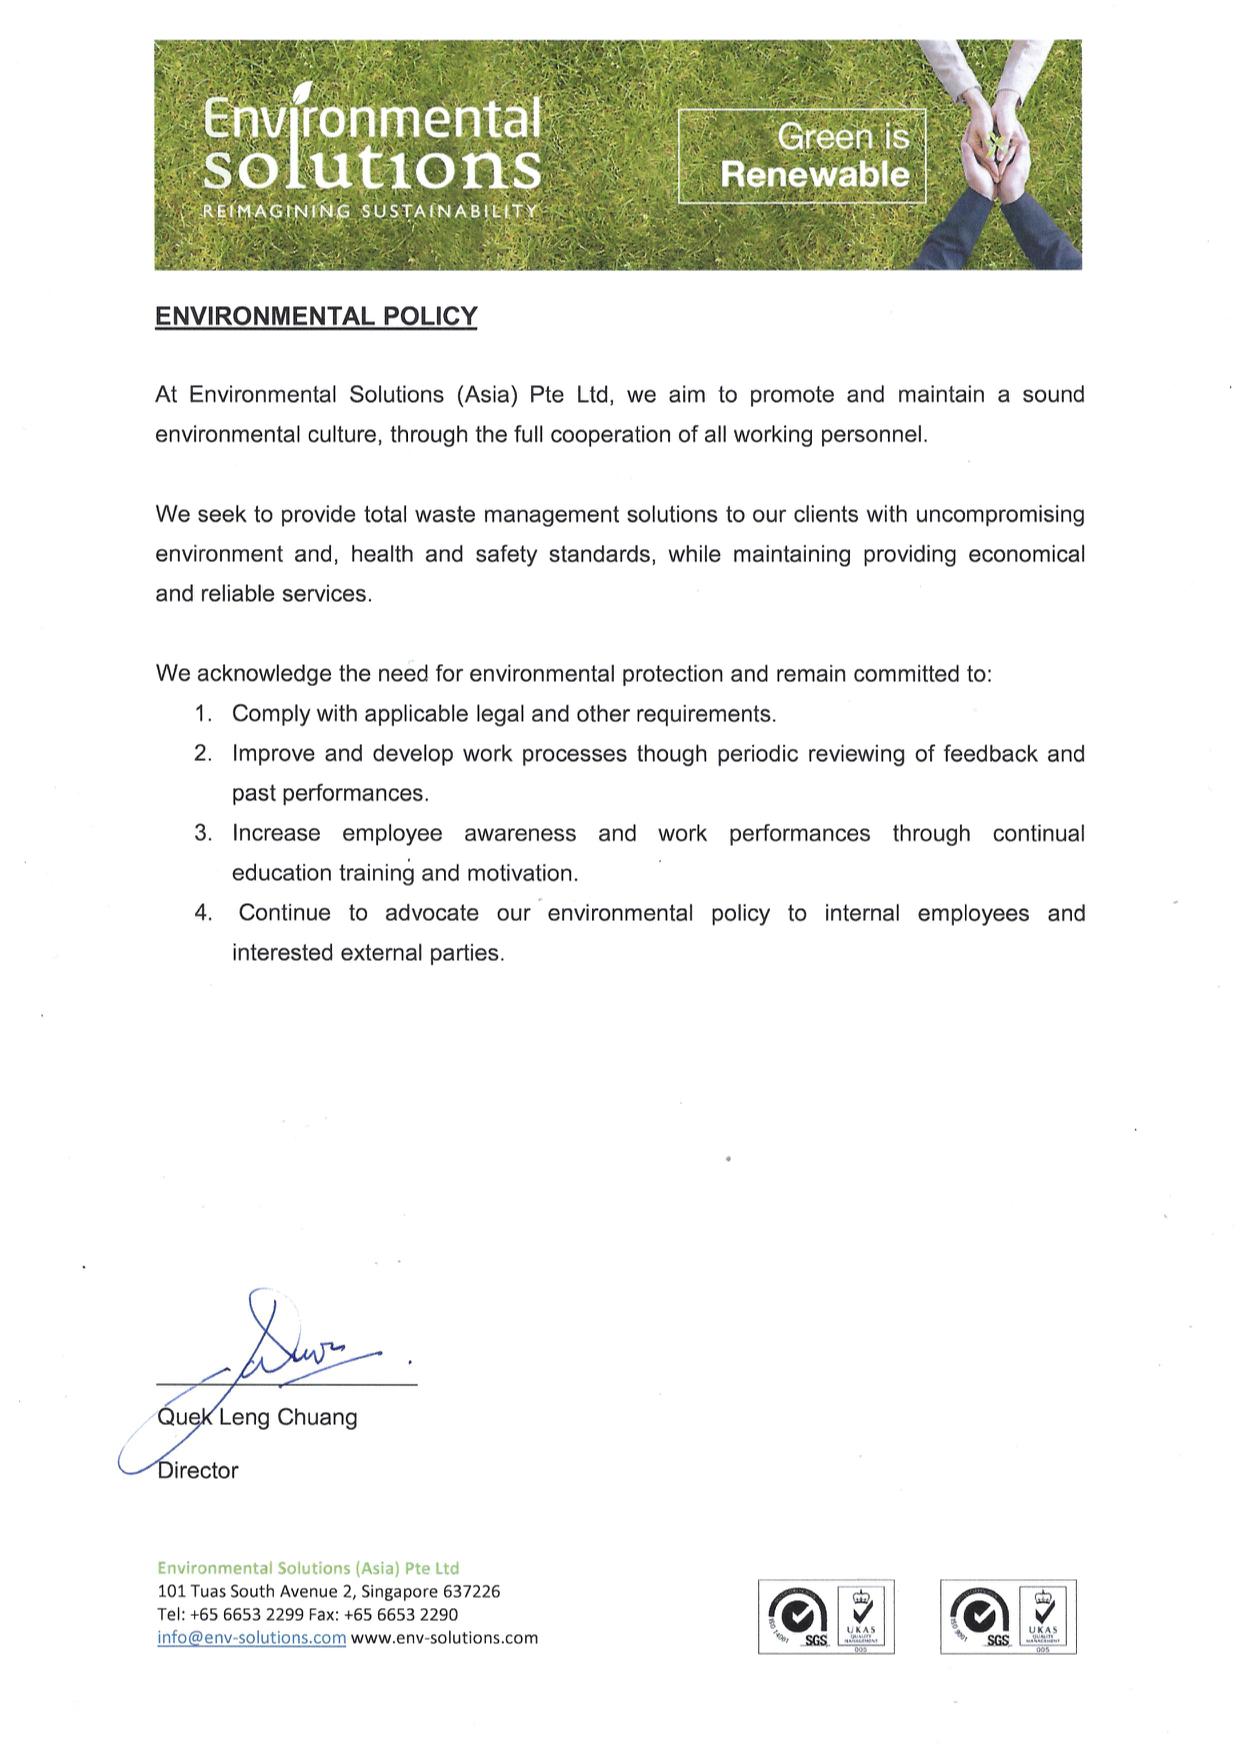 Environmental Solutions (Asia) Environmental Policy 2019